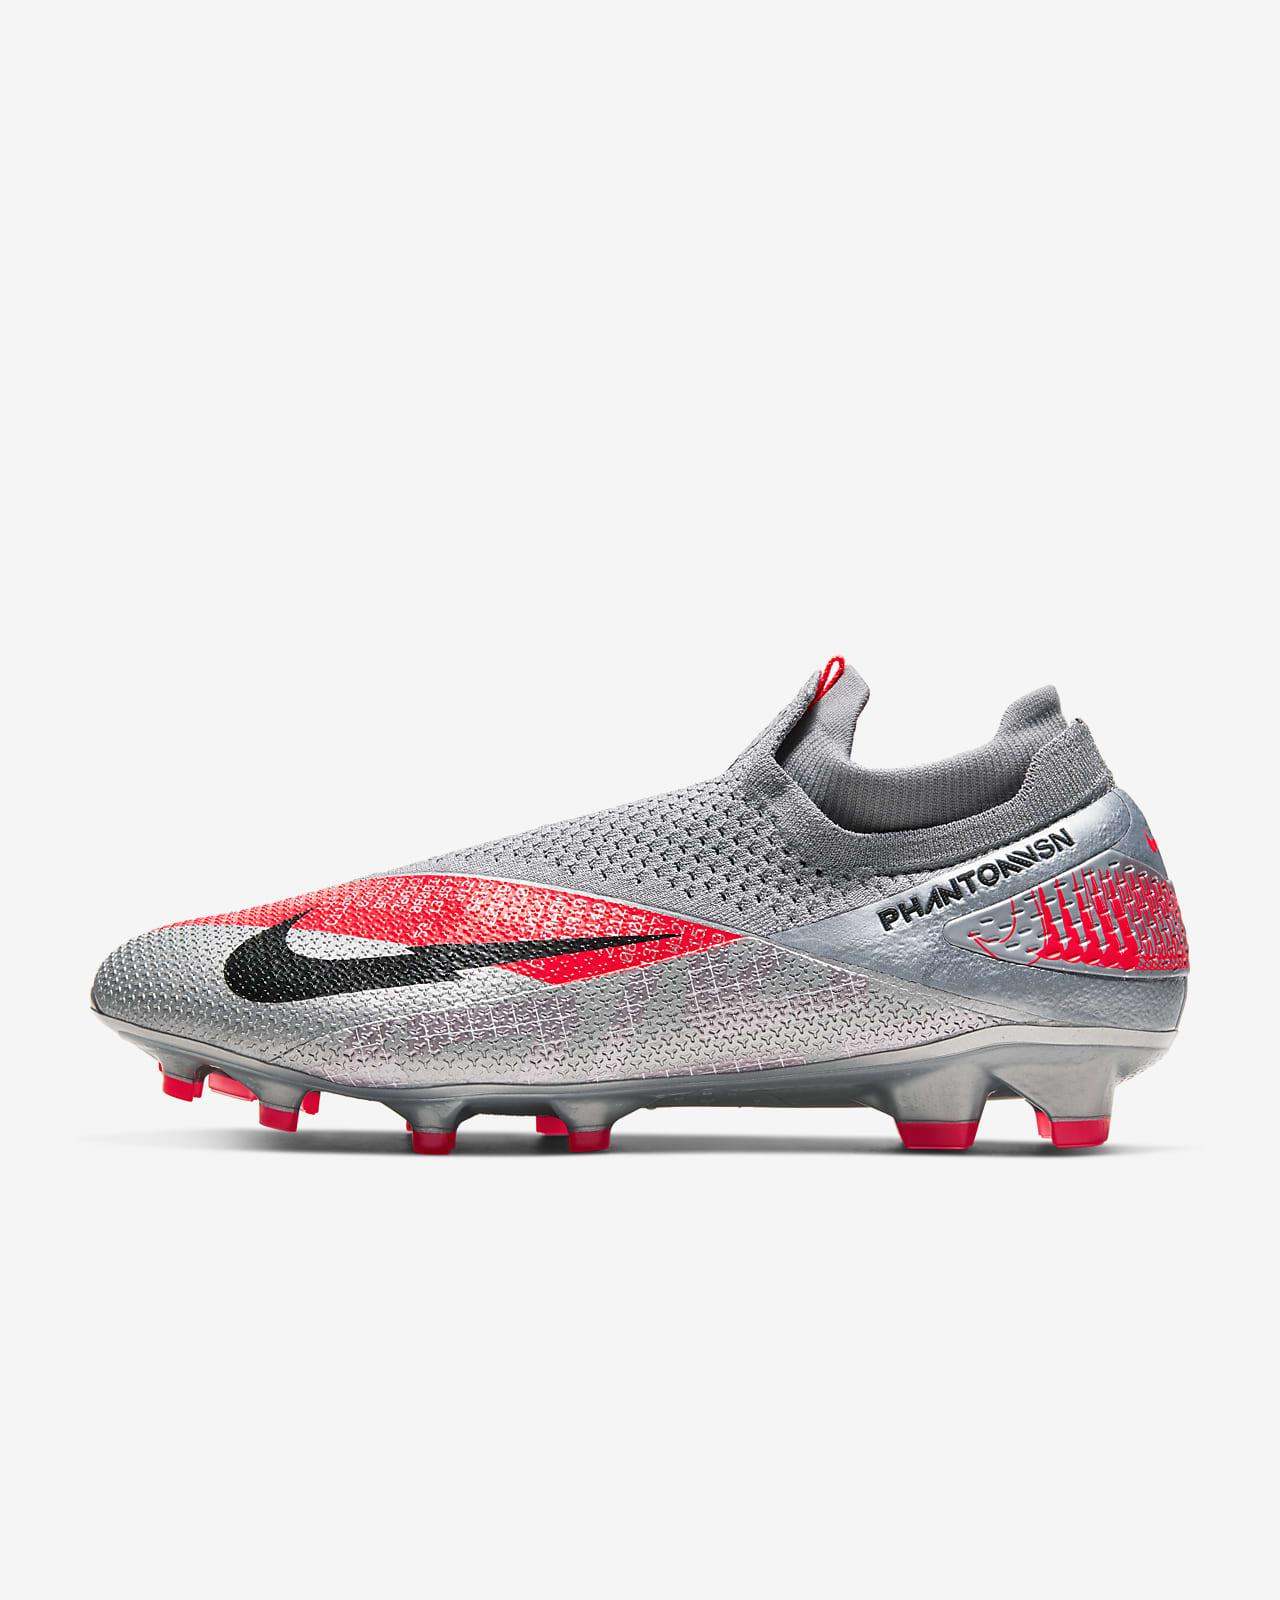 Fotbollssko för gräs Nike Phantom Vision 2 Elite Dynamic Fit FG